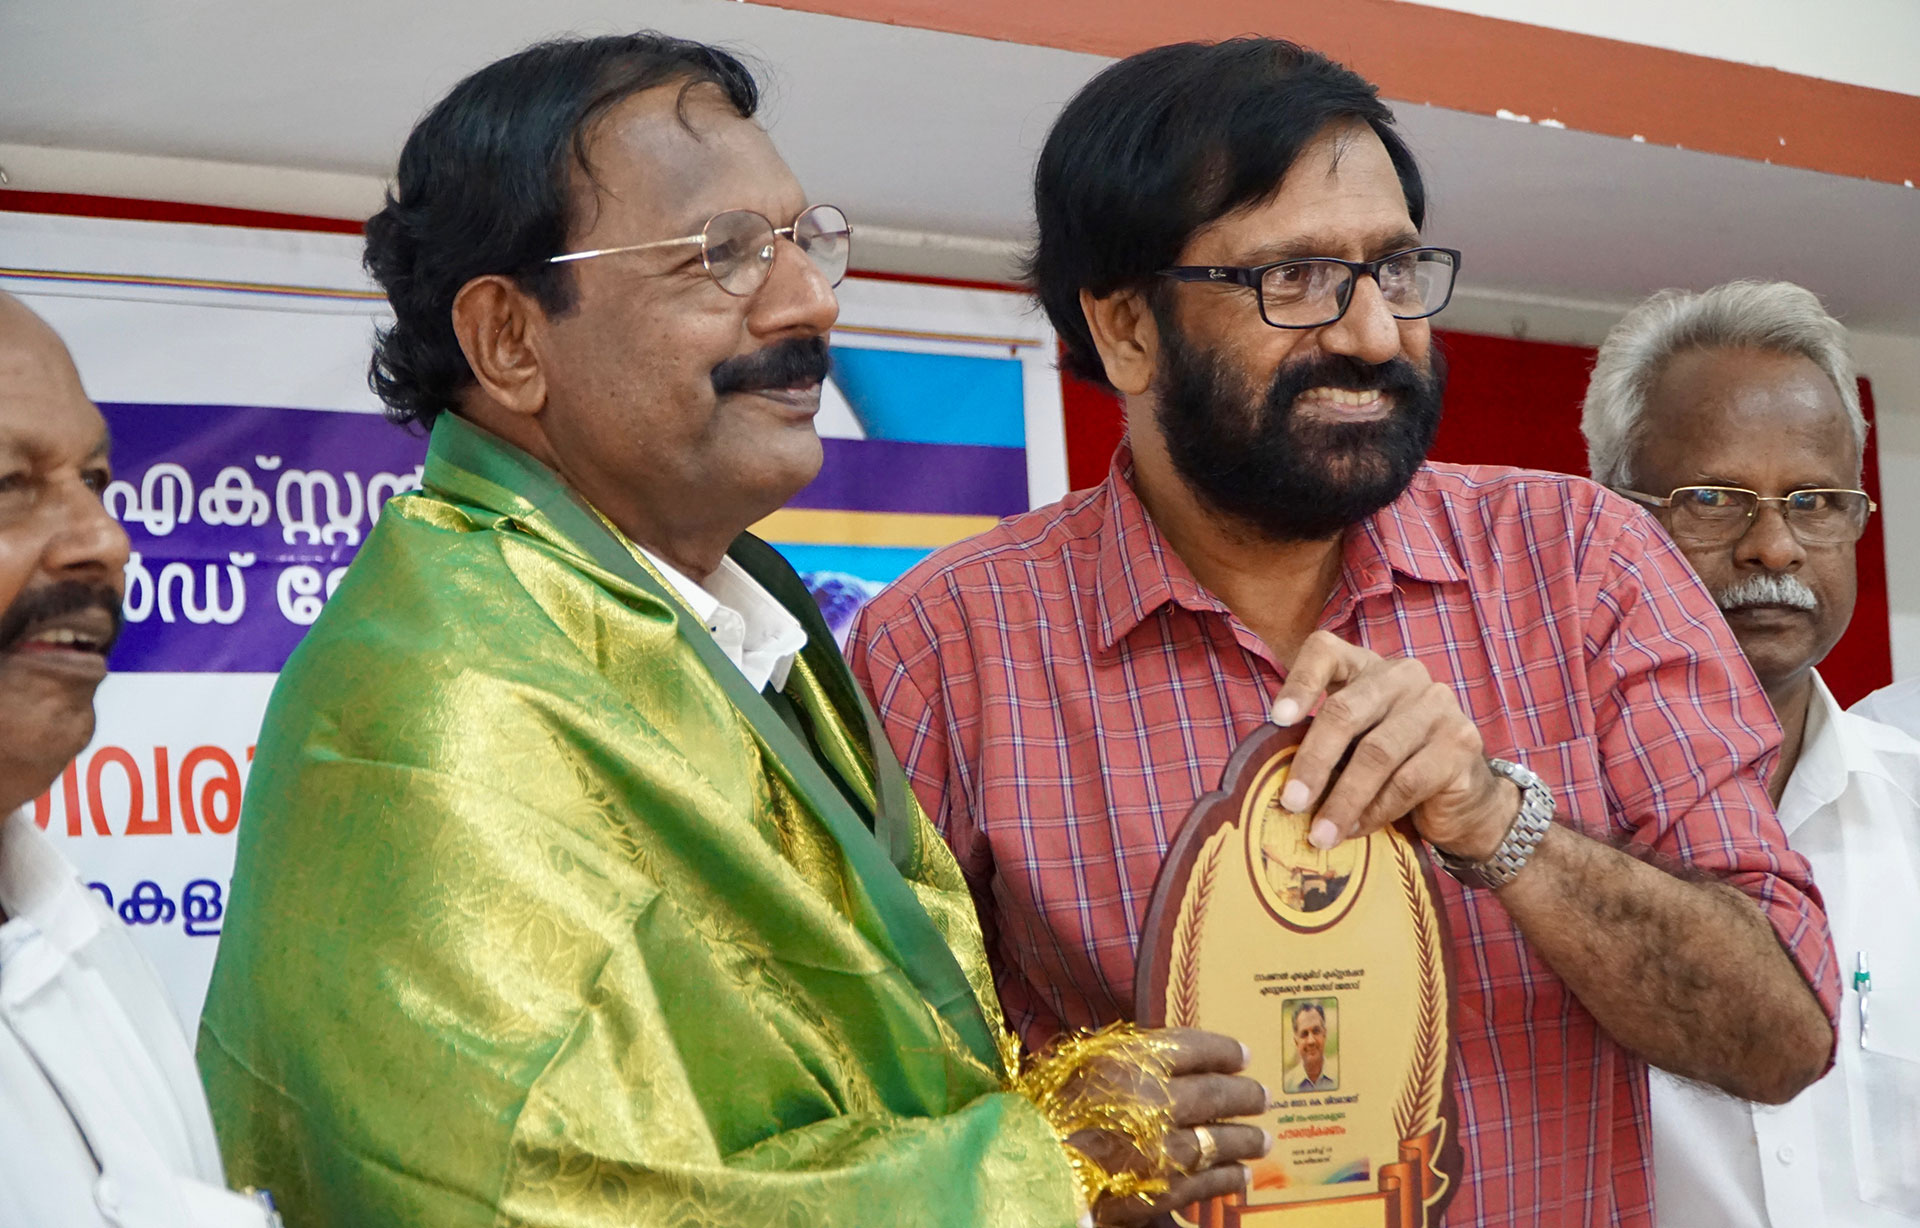 K.P. Ramanunni presents an award to K. Sivaraj, a Dalit education reformer. (Photo by Krishna Narayanamurti)